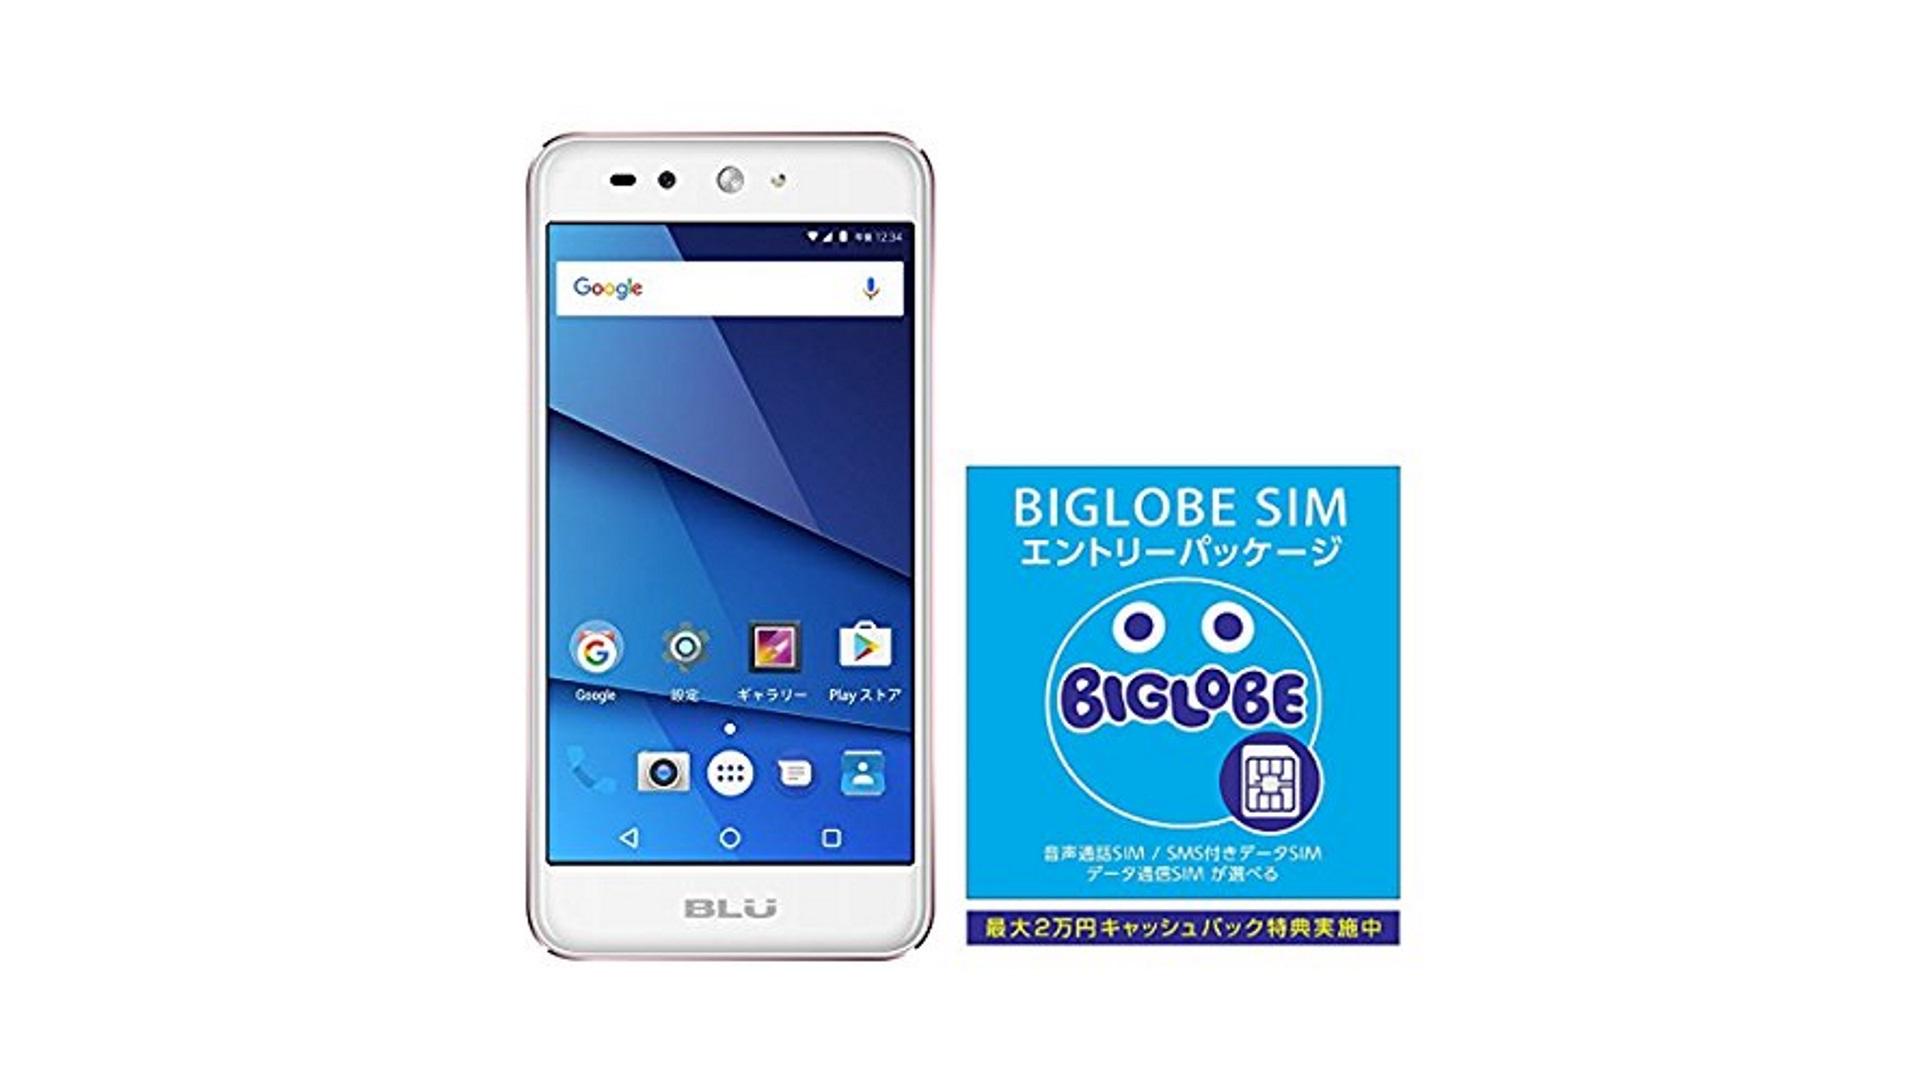 Amazon「GRAND M/X LTE」とMVNO SIMセットが本体よりお買い得に